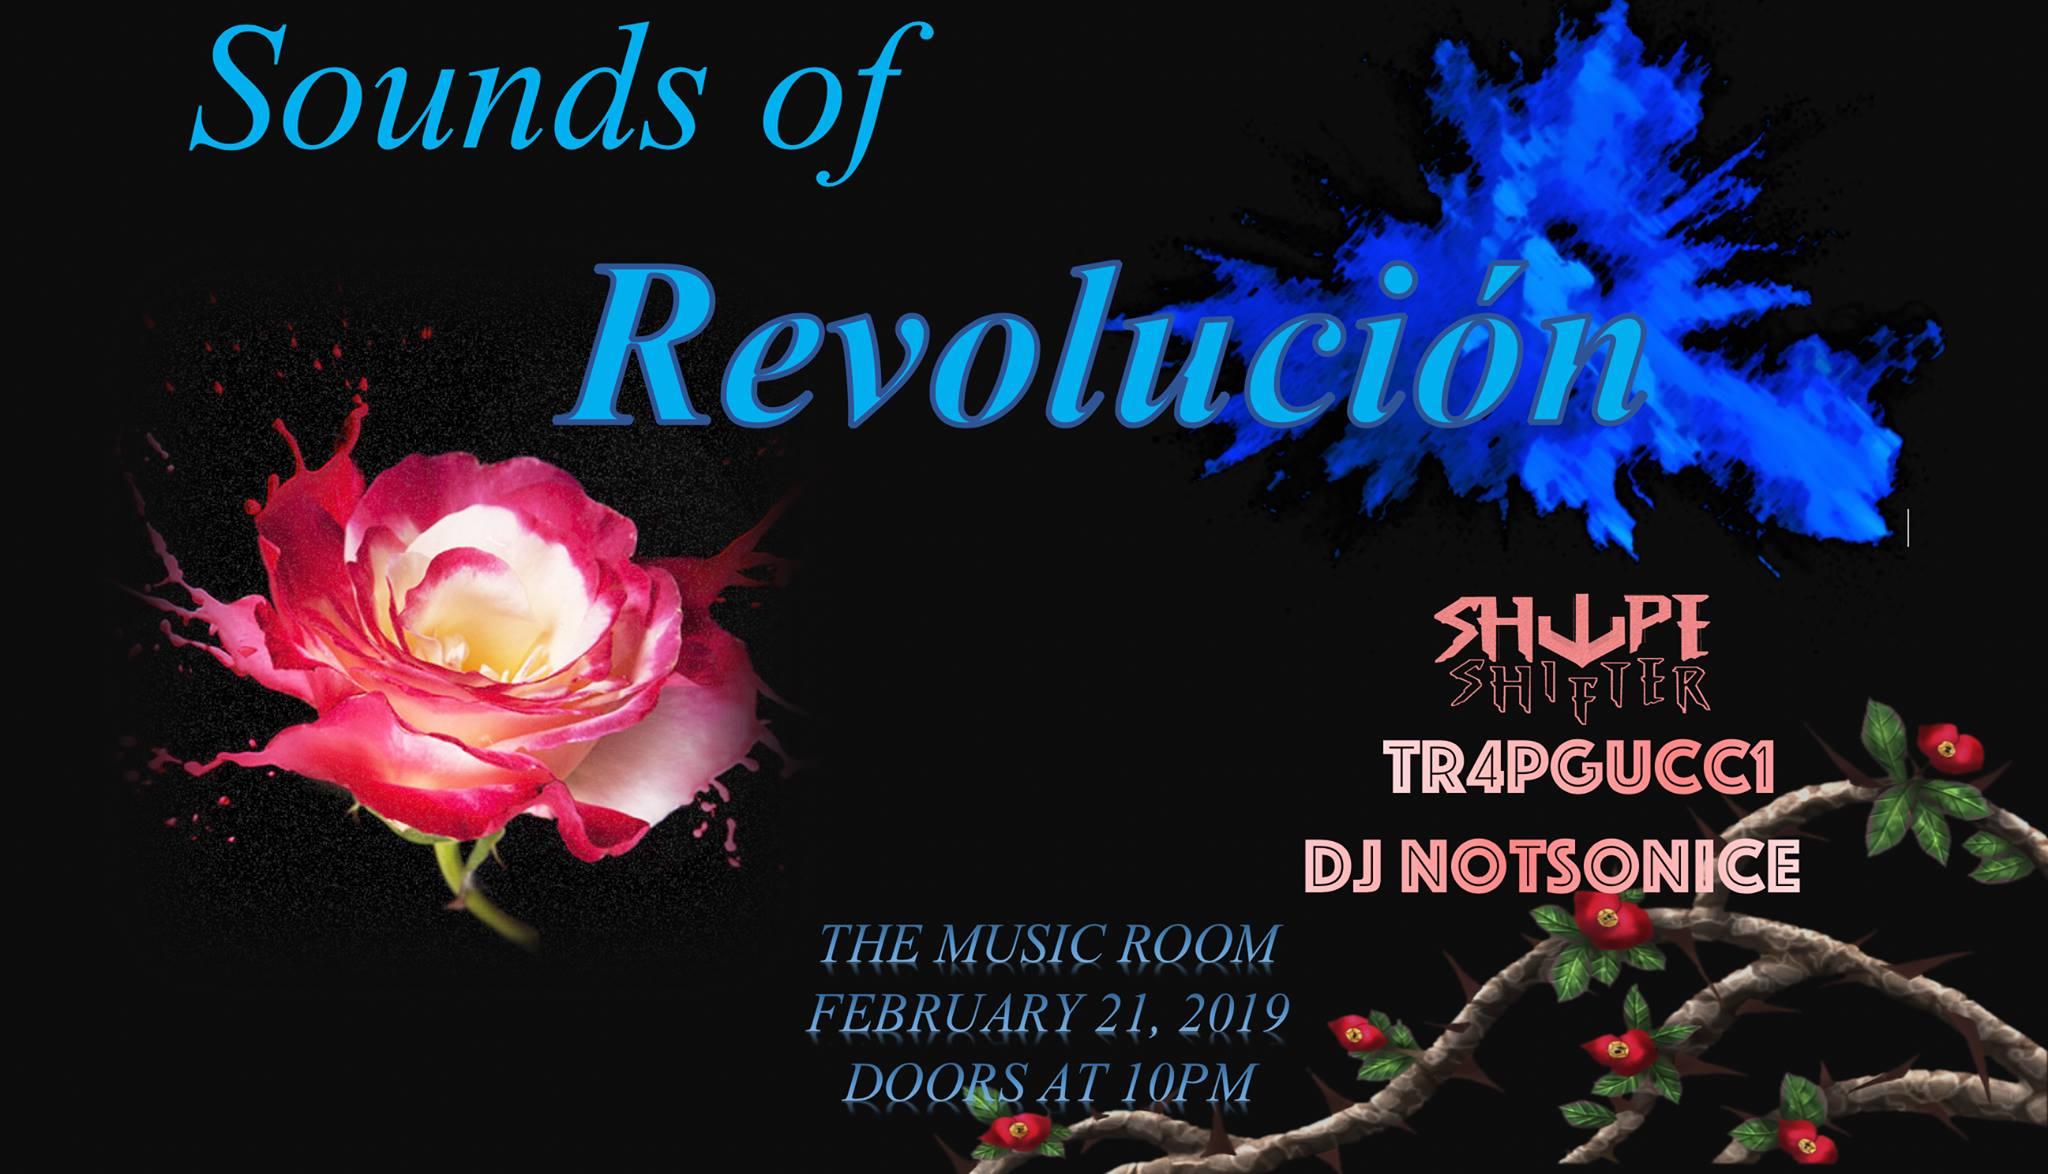 sounds of revolucion